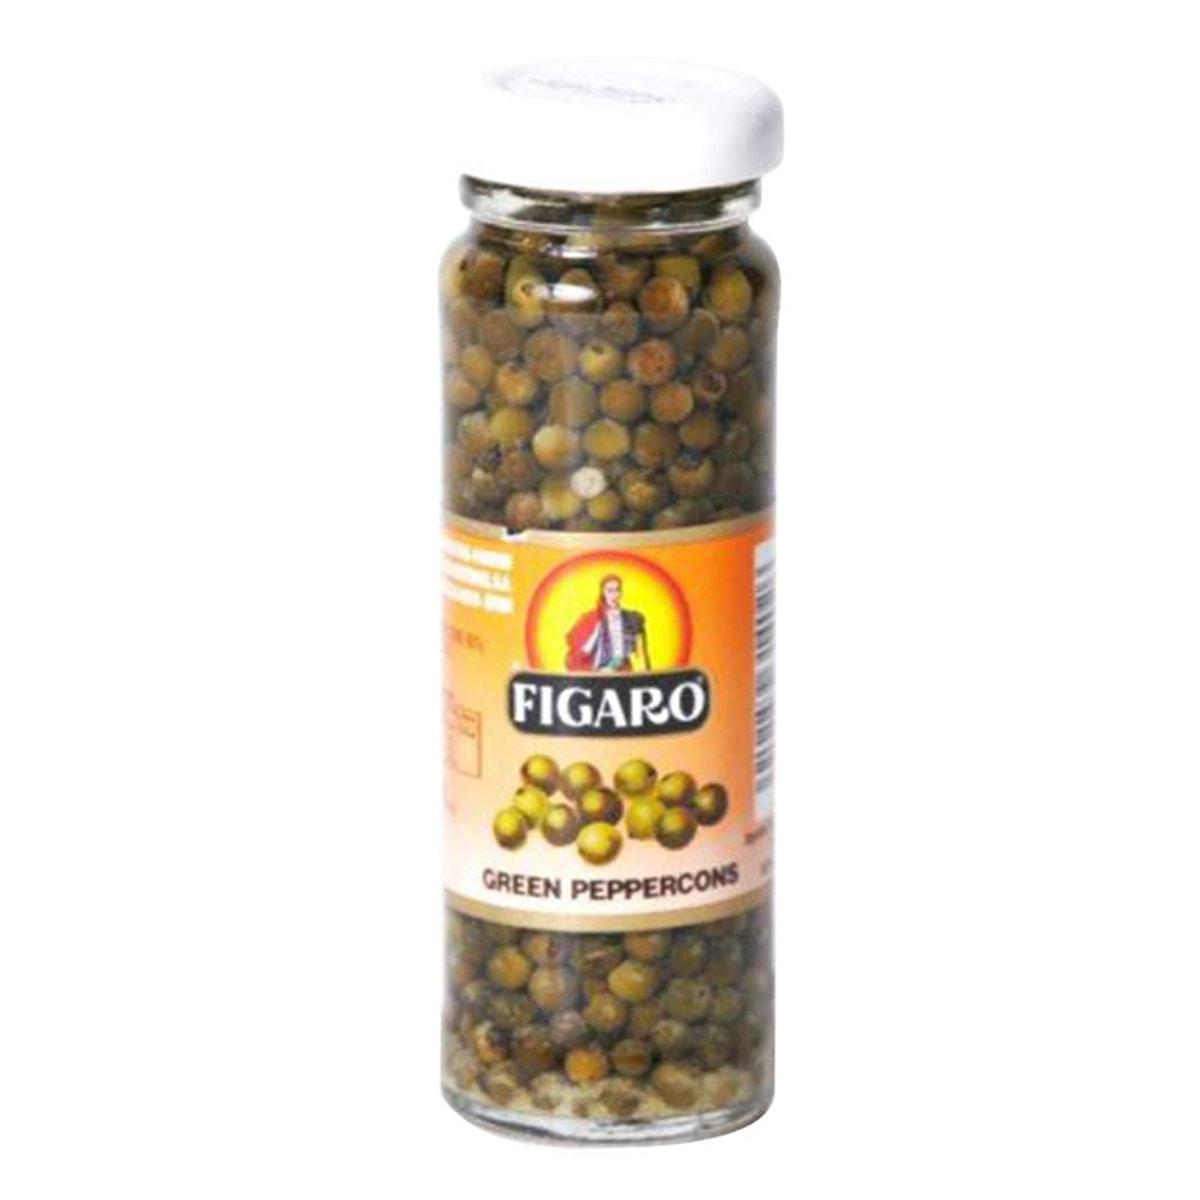 Buy Figaro Green Peppercorns in Vinegar - 110 gm